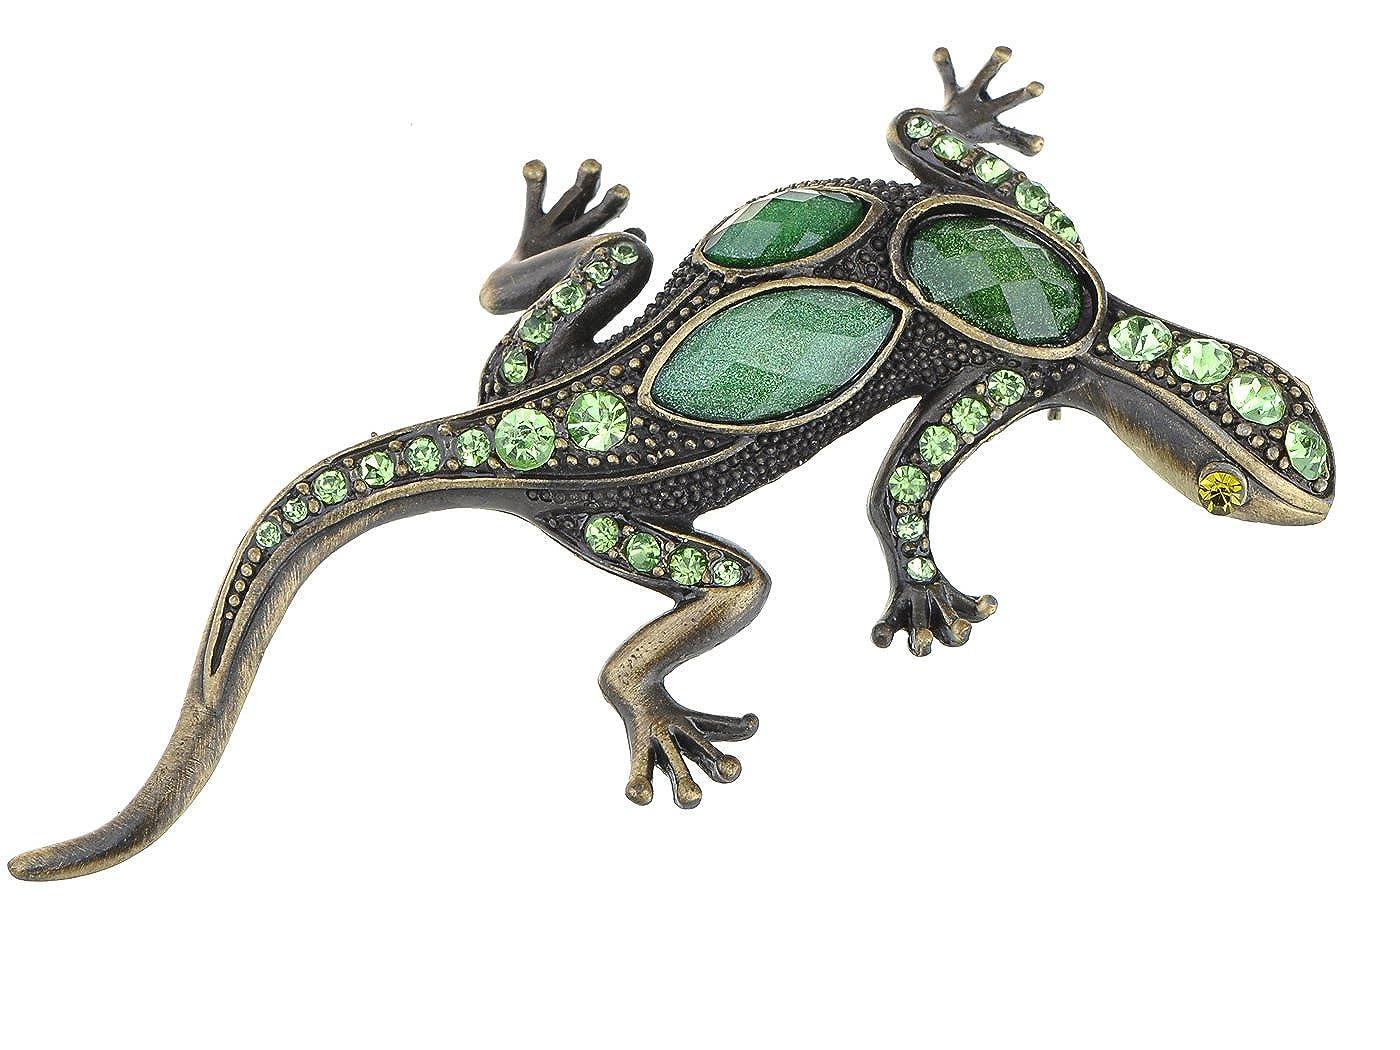 Alilang Gunmetal Tone Green Rhinestones Antique Vintage Inspired Lizard Brooch Pin B0363